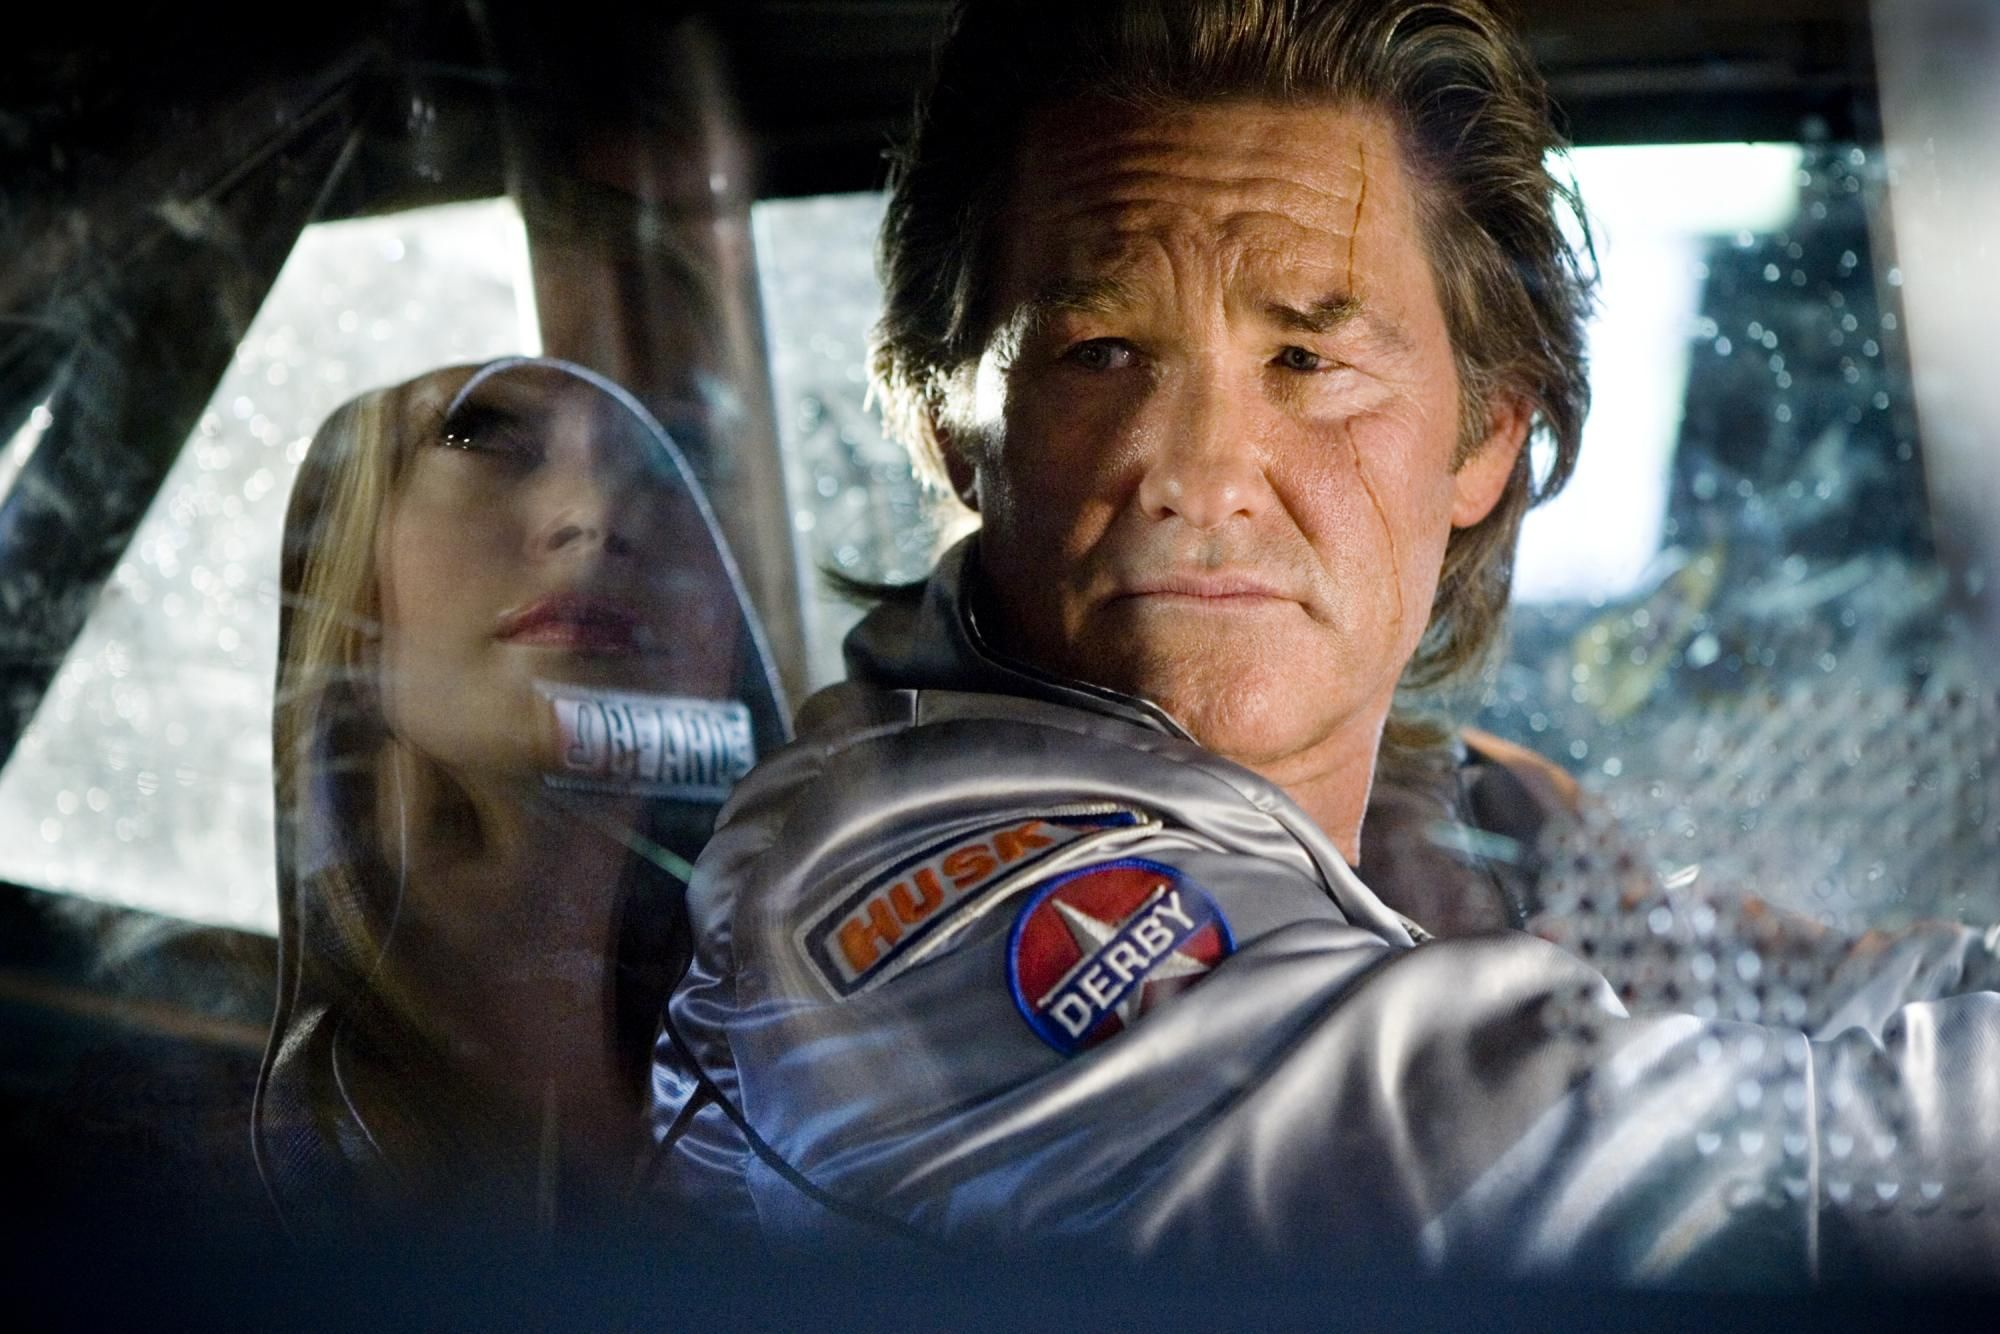 Kurt Russell as Stuntman Mike in Death Proof (2007)